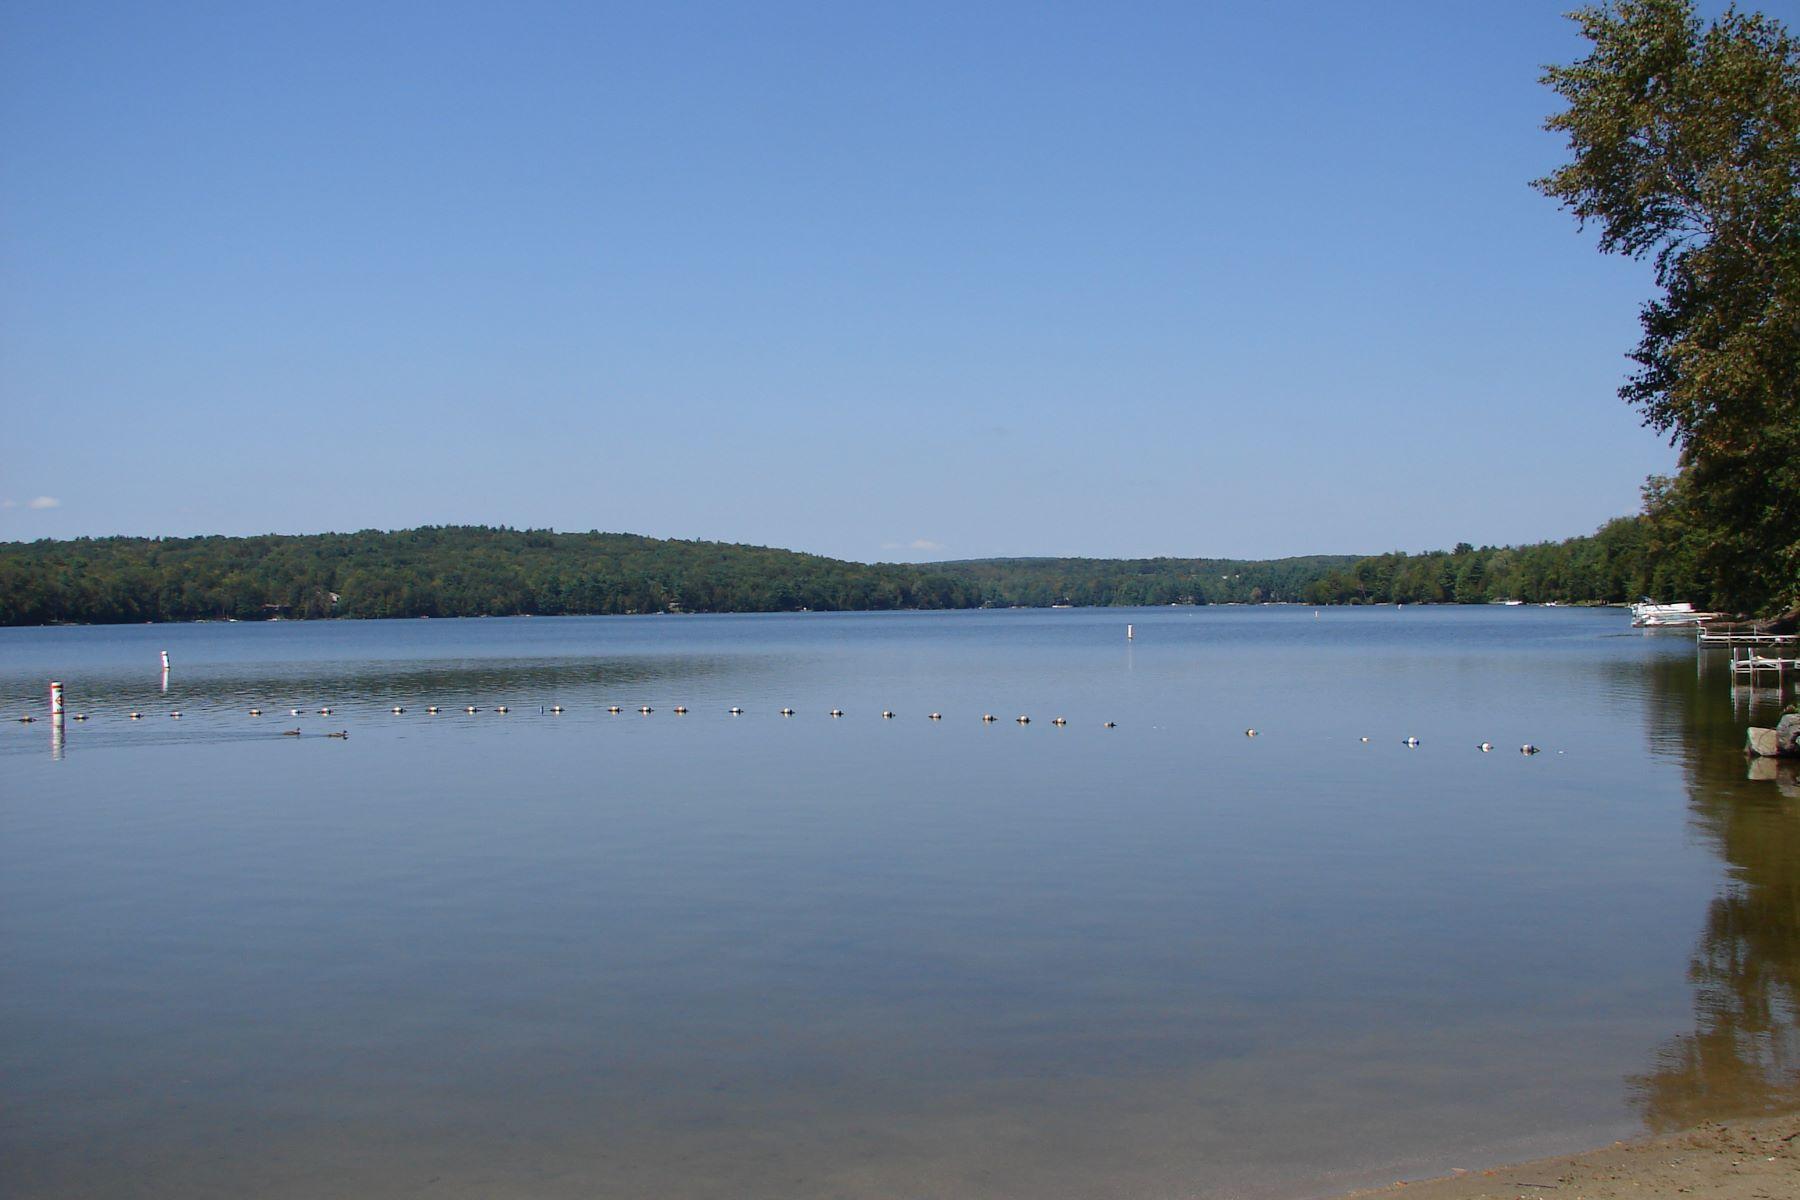 Land for Sale at Membership Lot at Woodridge Lake 527 East Hyerdale Drive, Goshen, Connecticut, 06756 United States